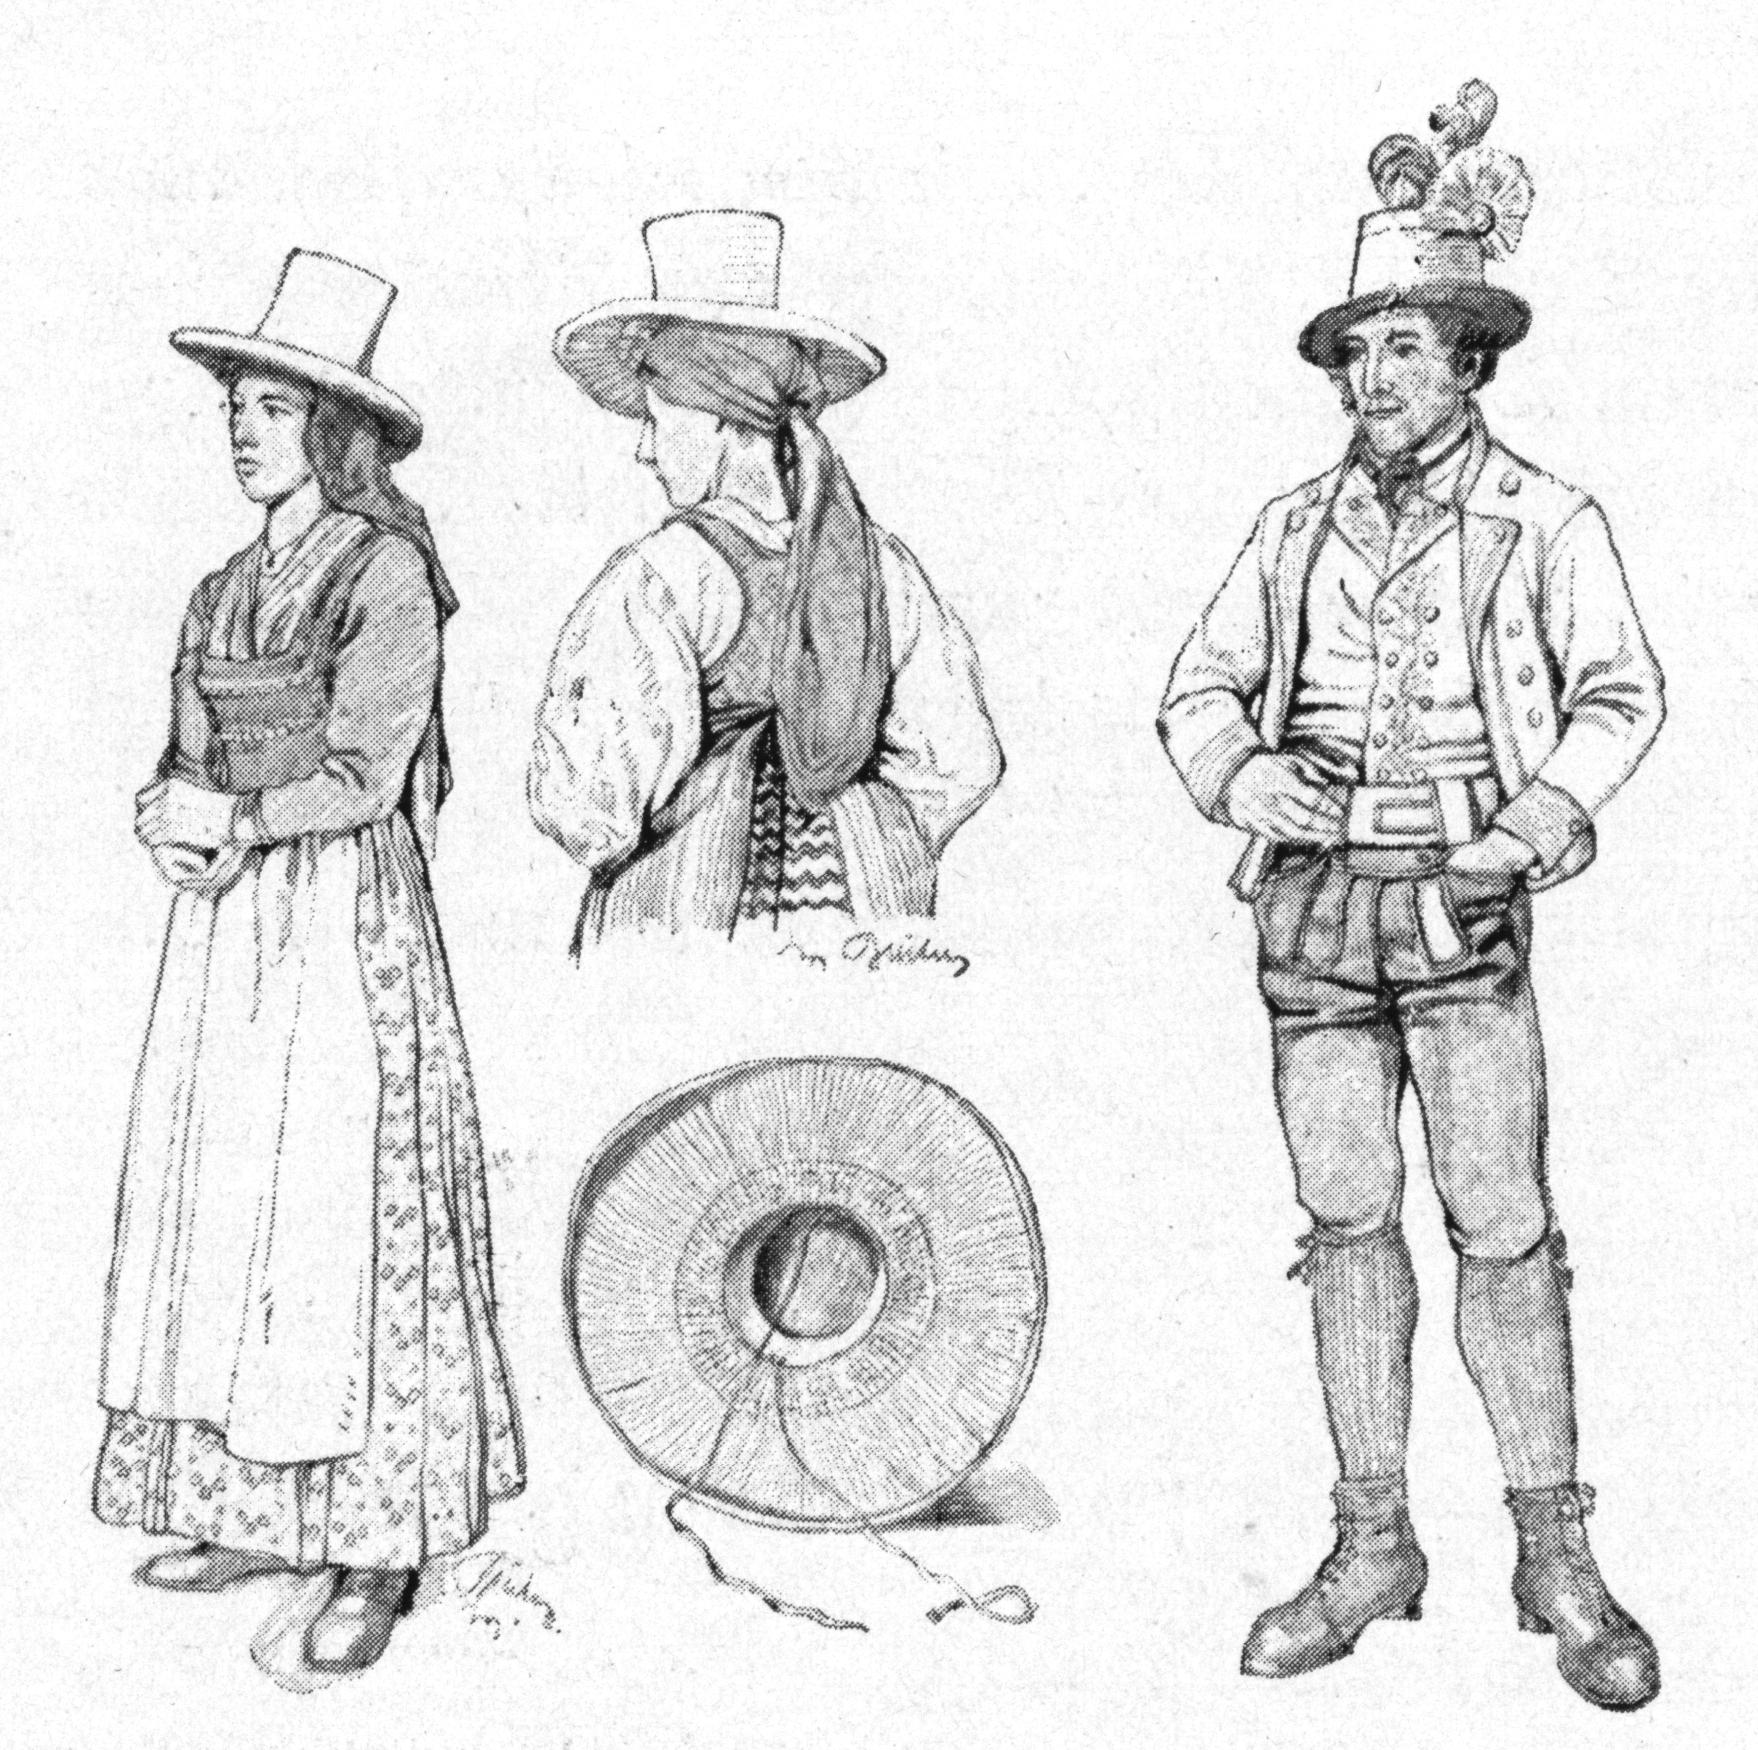 020 Alte Grundlseer Trachten - um 1840.jpg